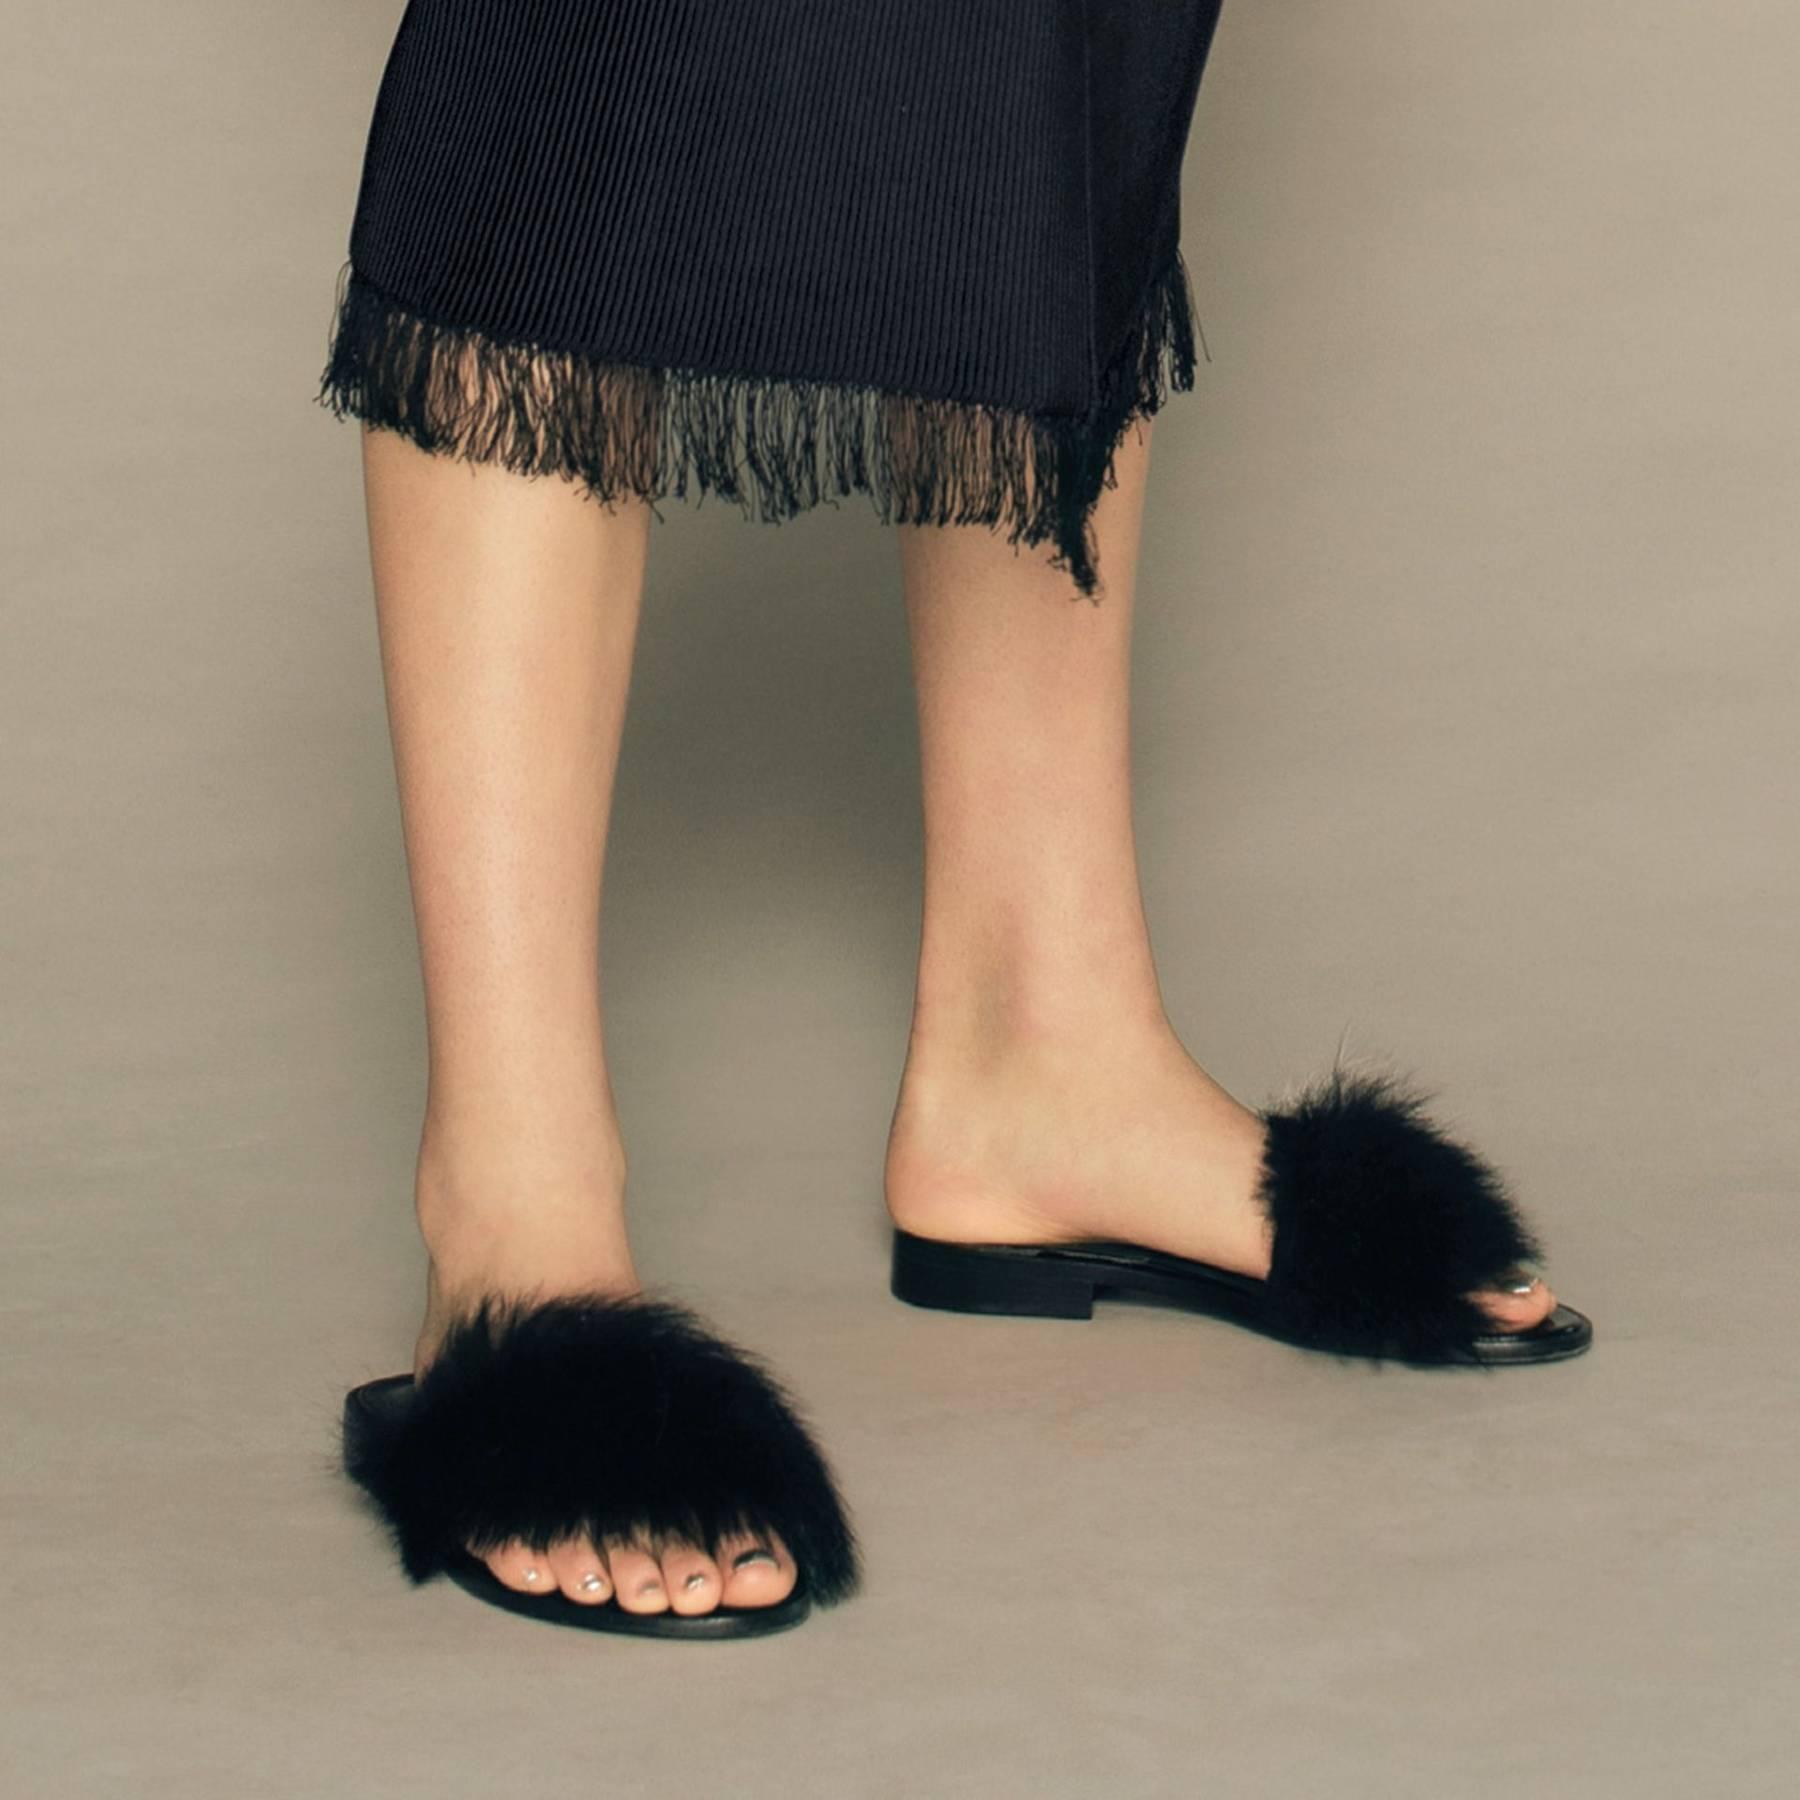 65c4b63d0a5 Best Fluffy Sliders  The Vogue Edit